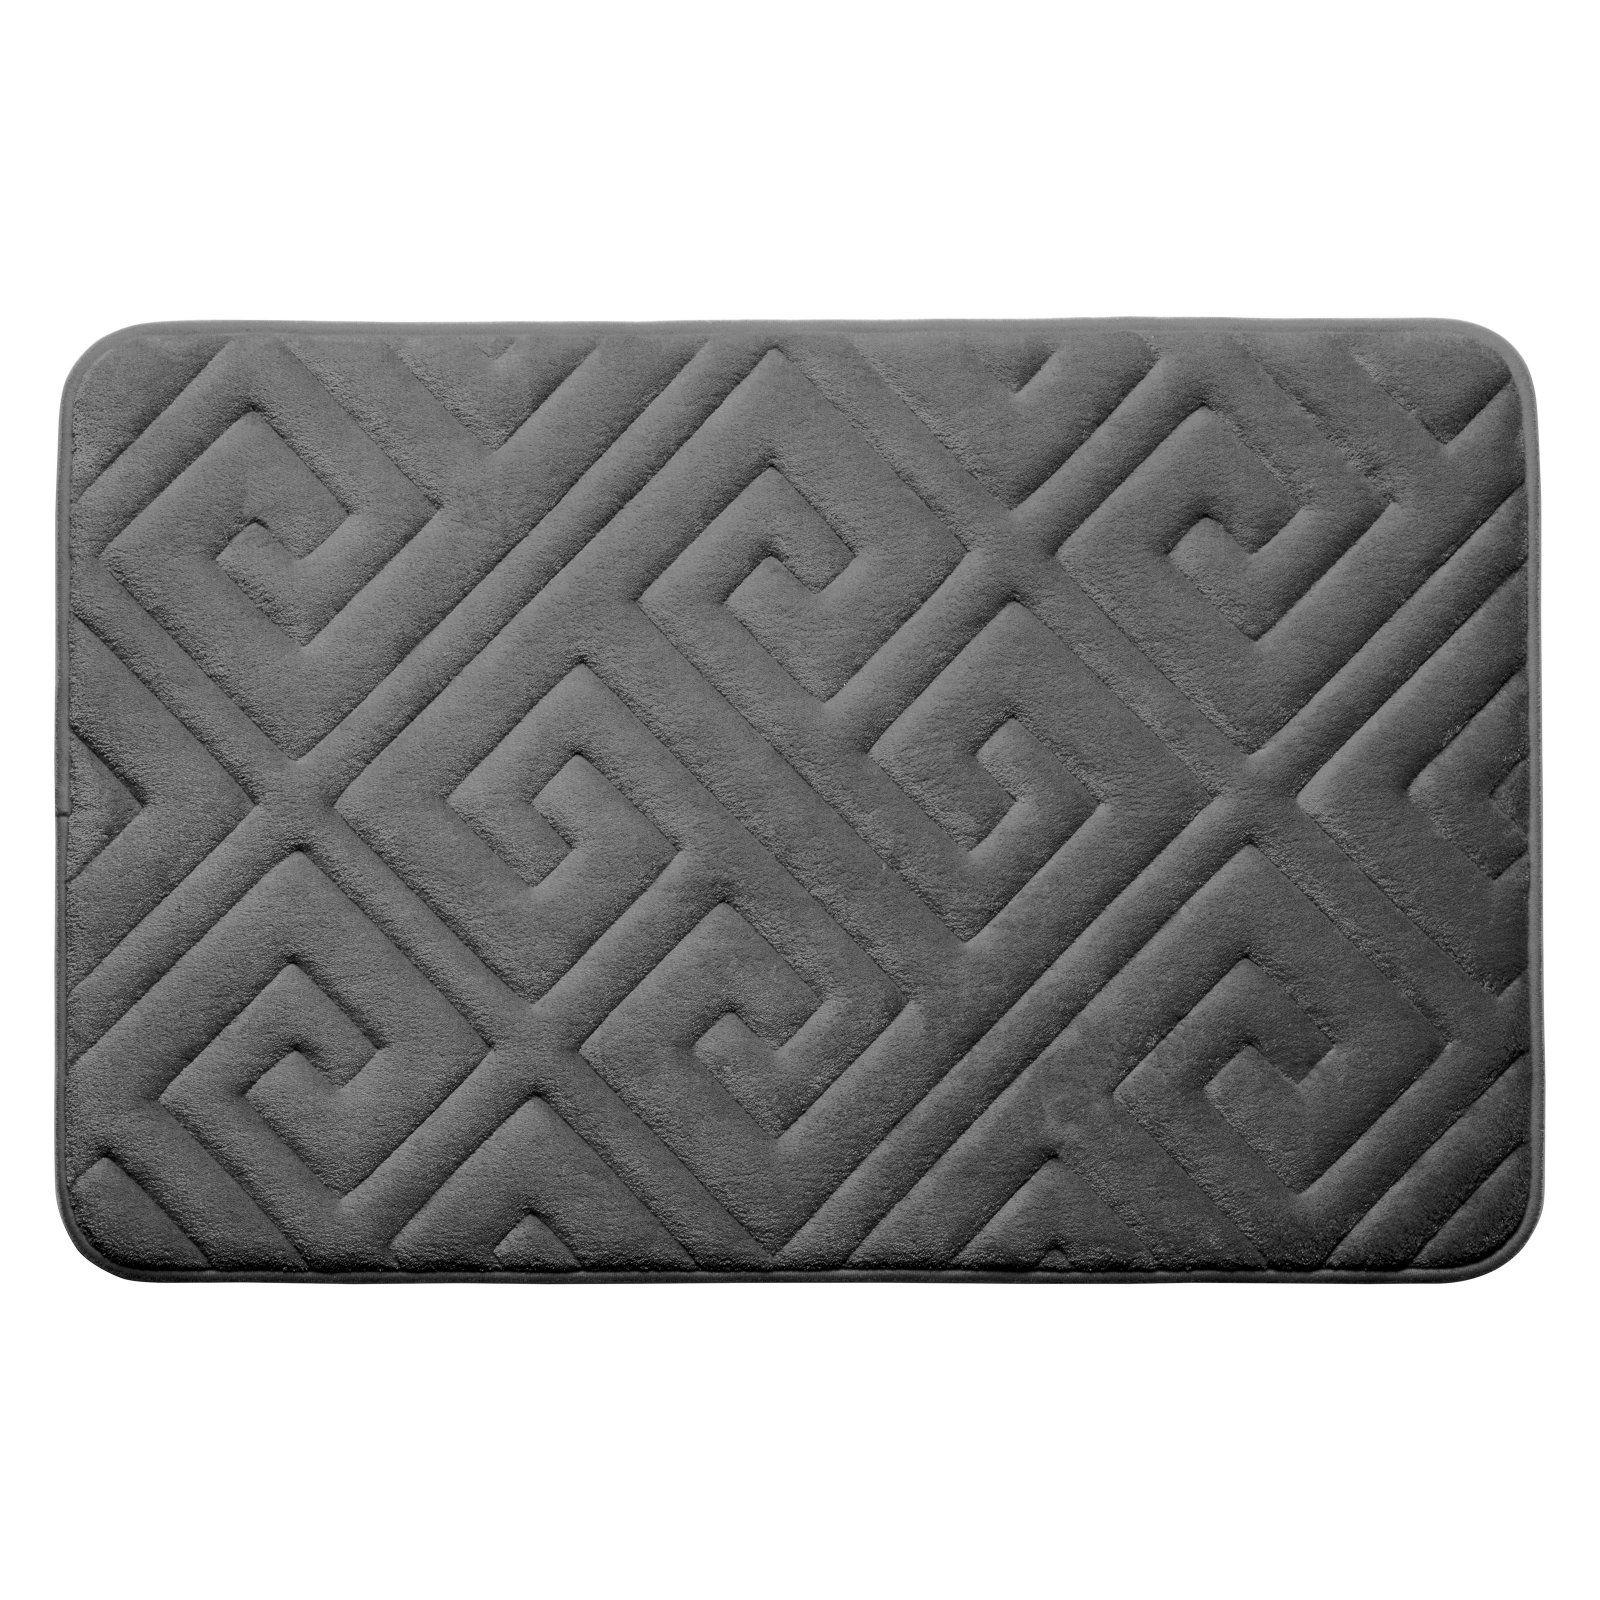 Bounce Comfort Caicos Premium Extra Thick Memory Foam Bath Mat